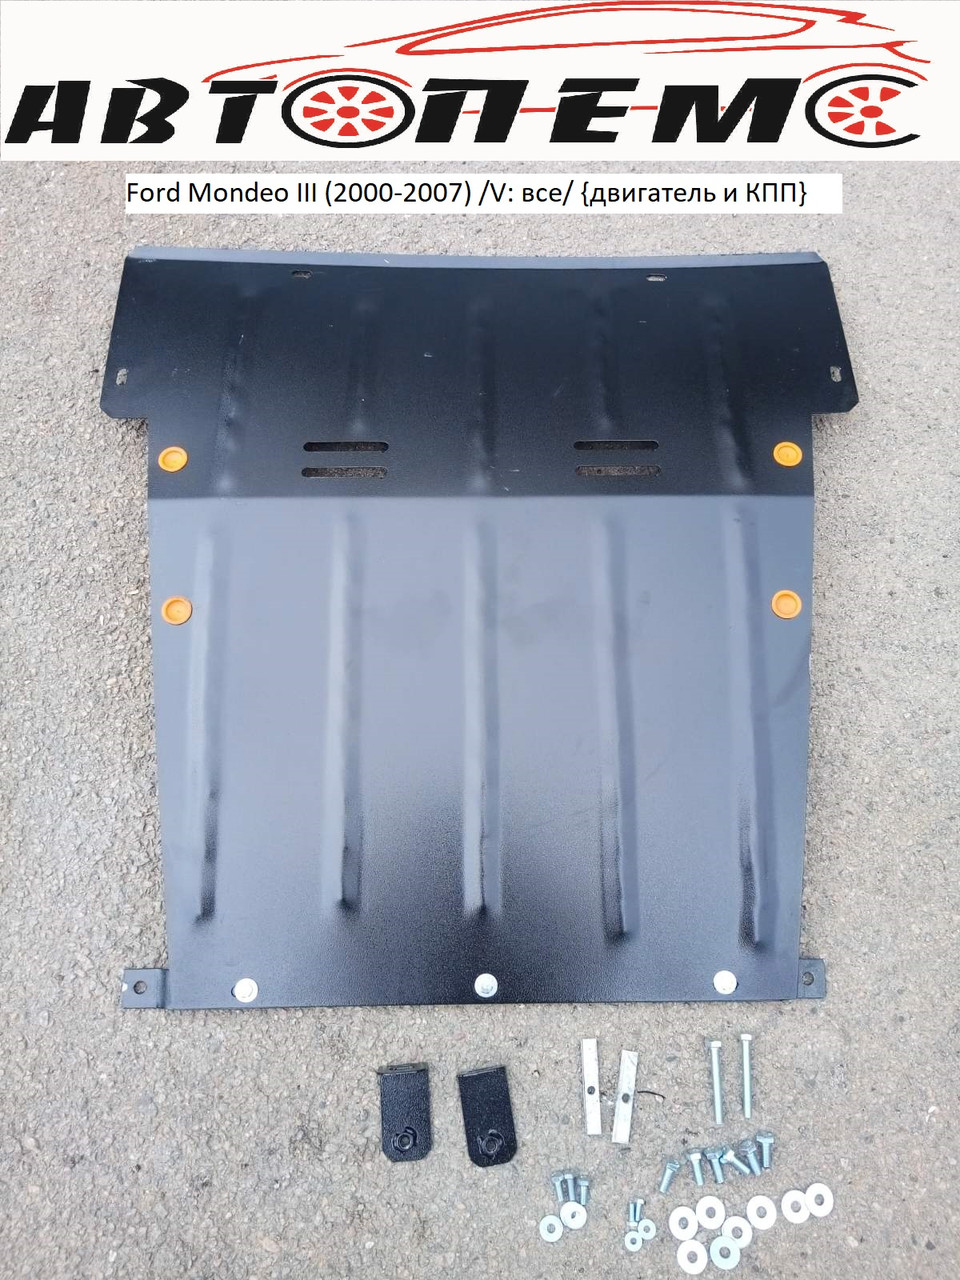 Защита картера двигателя Ford Mondeo III 2000-2007 ТМ Титан